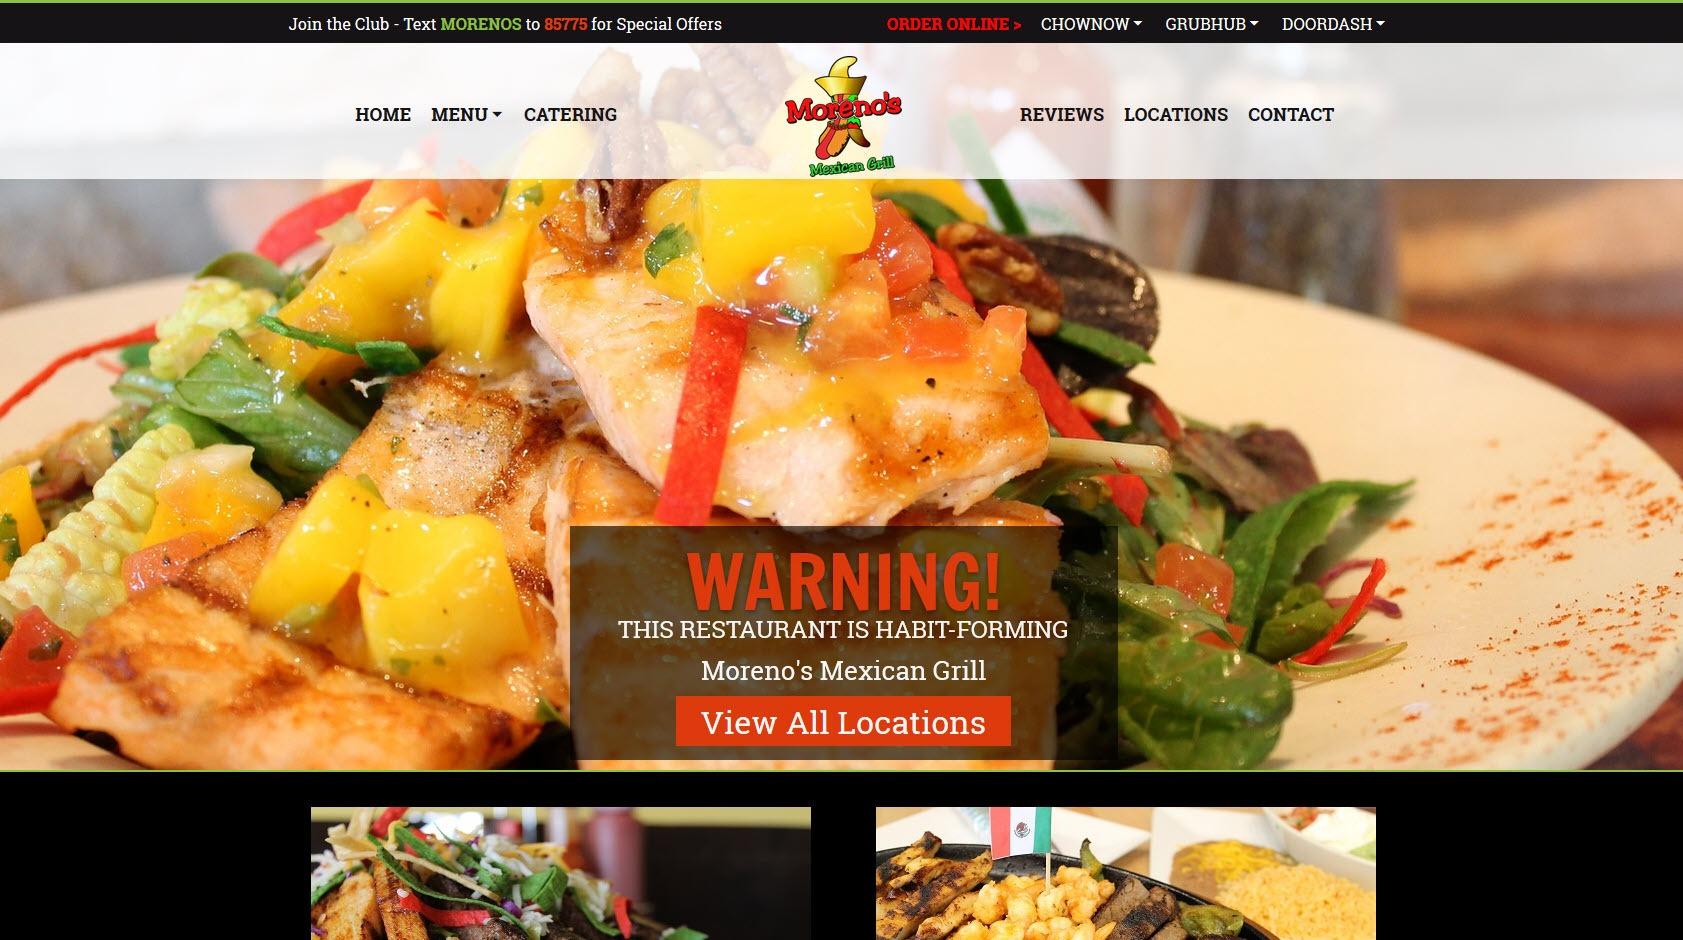 Restaurant Web Design Screenshot - Moreno's Mexican Grill - Created By Web Designs Your Way - Santan Valley, AZ